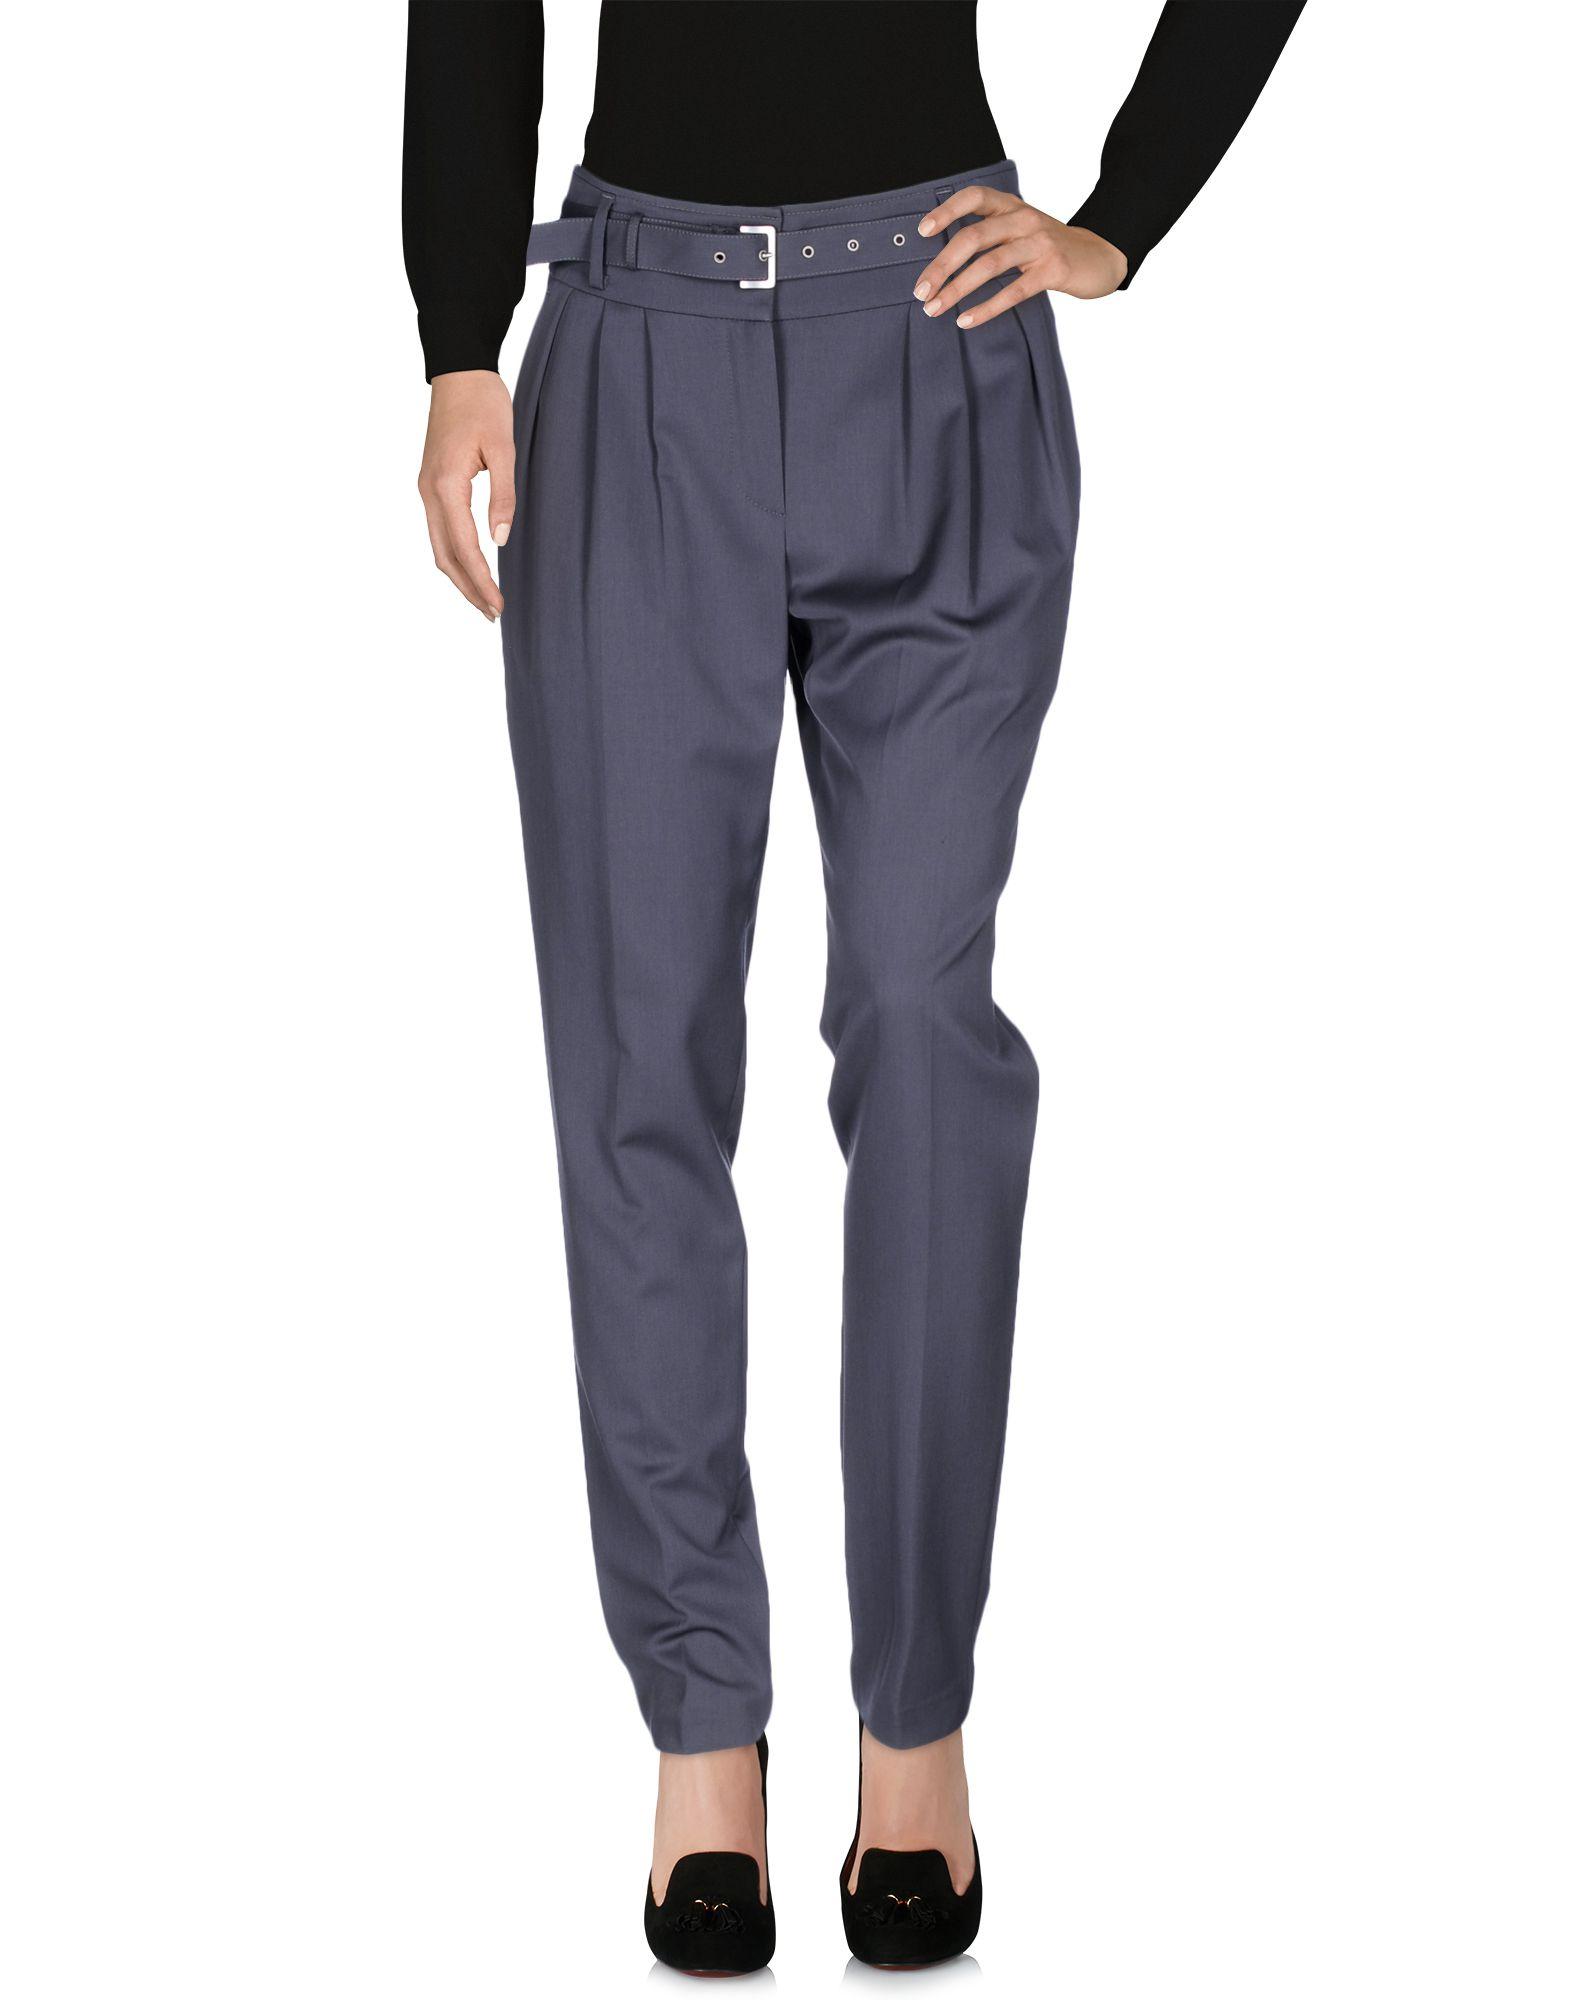 Pantalone Gunex Donna - Acquista online su FPdHIew5qf